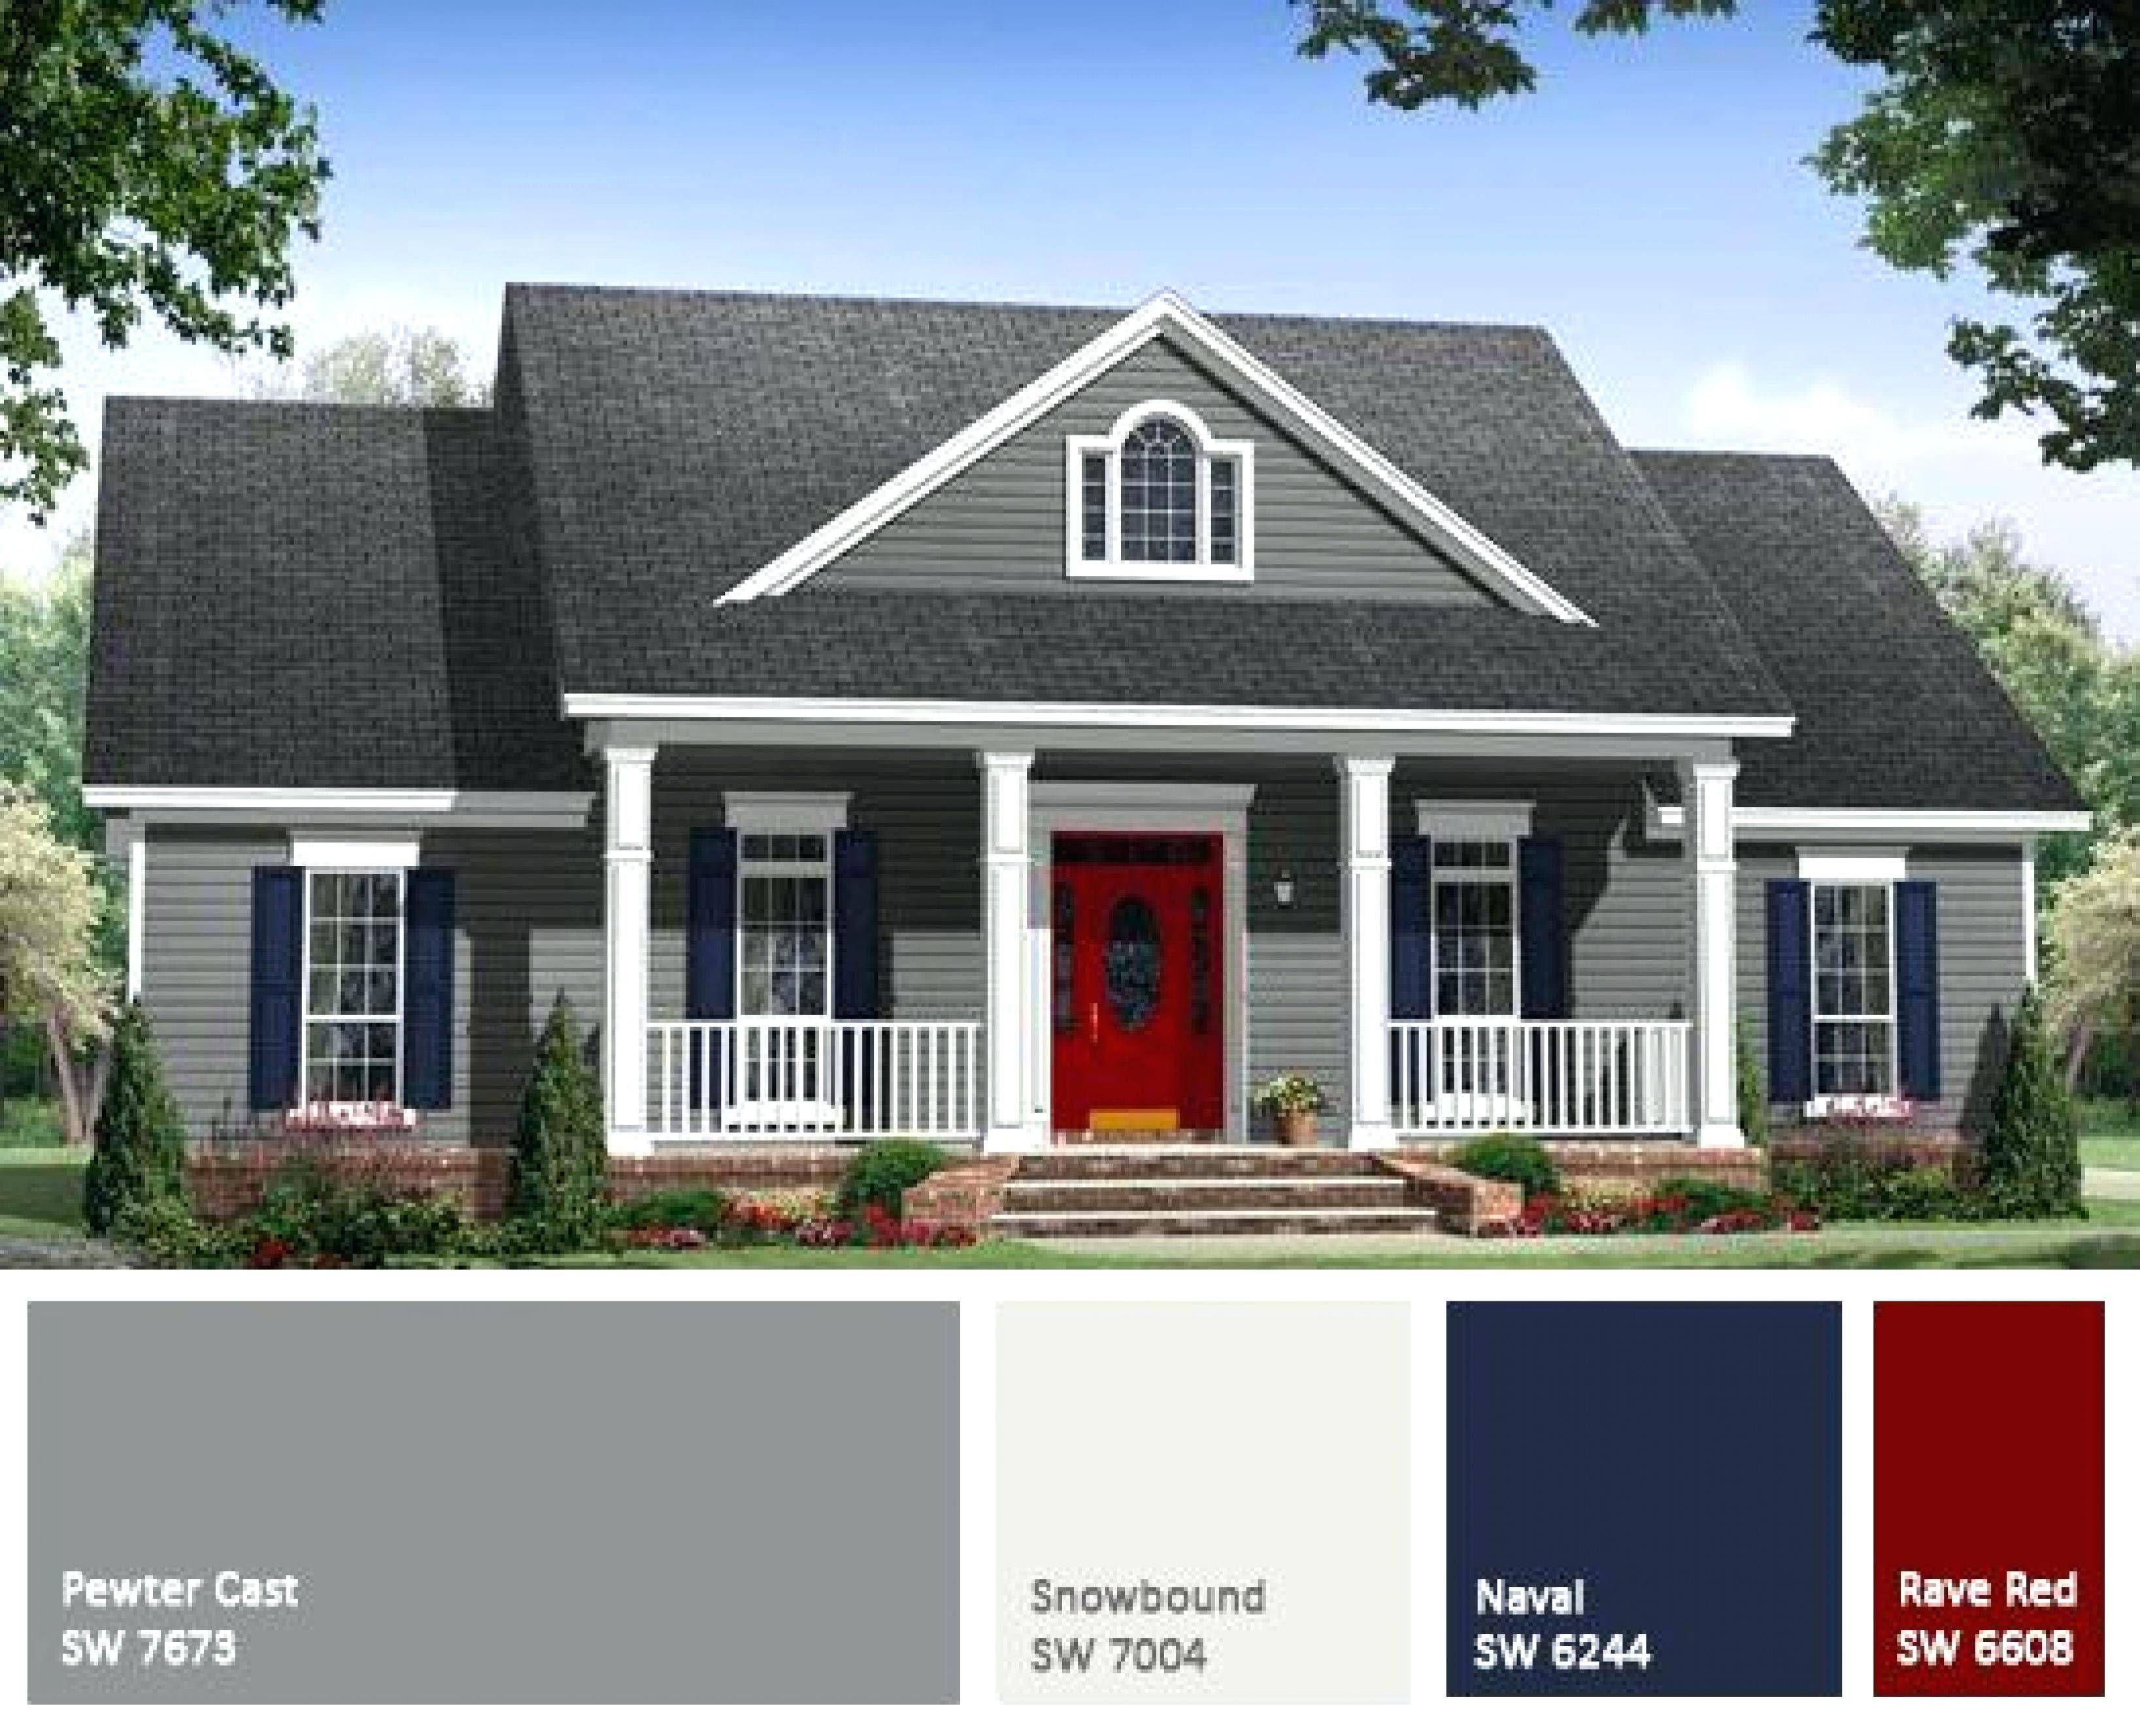 Two Tone Paint Ideas More Image Visite Gray House Exterior Exterior Paint Colors For House House Paint Exterior